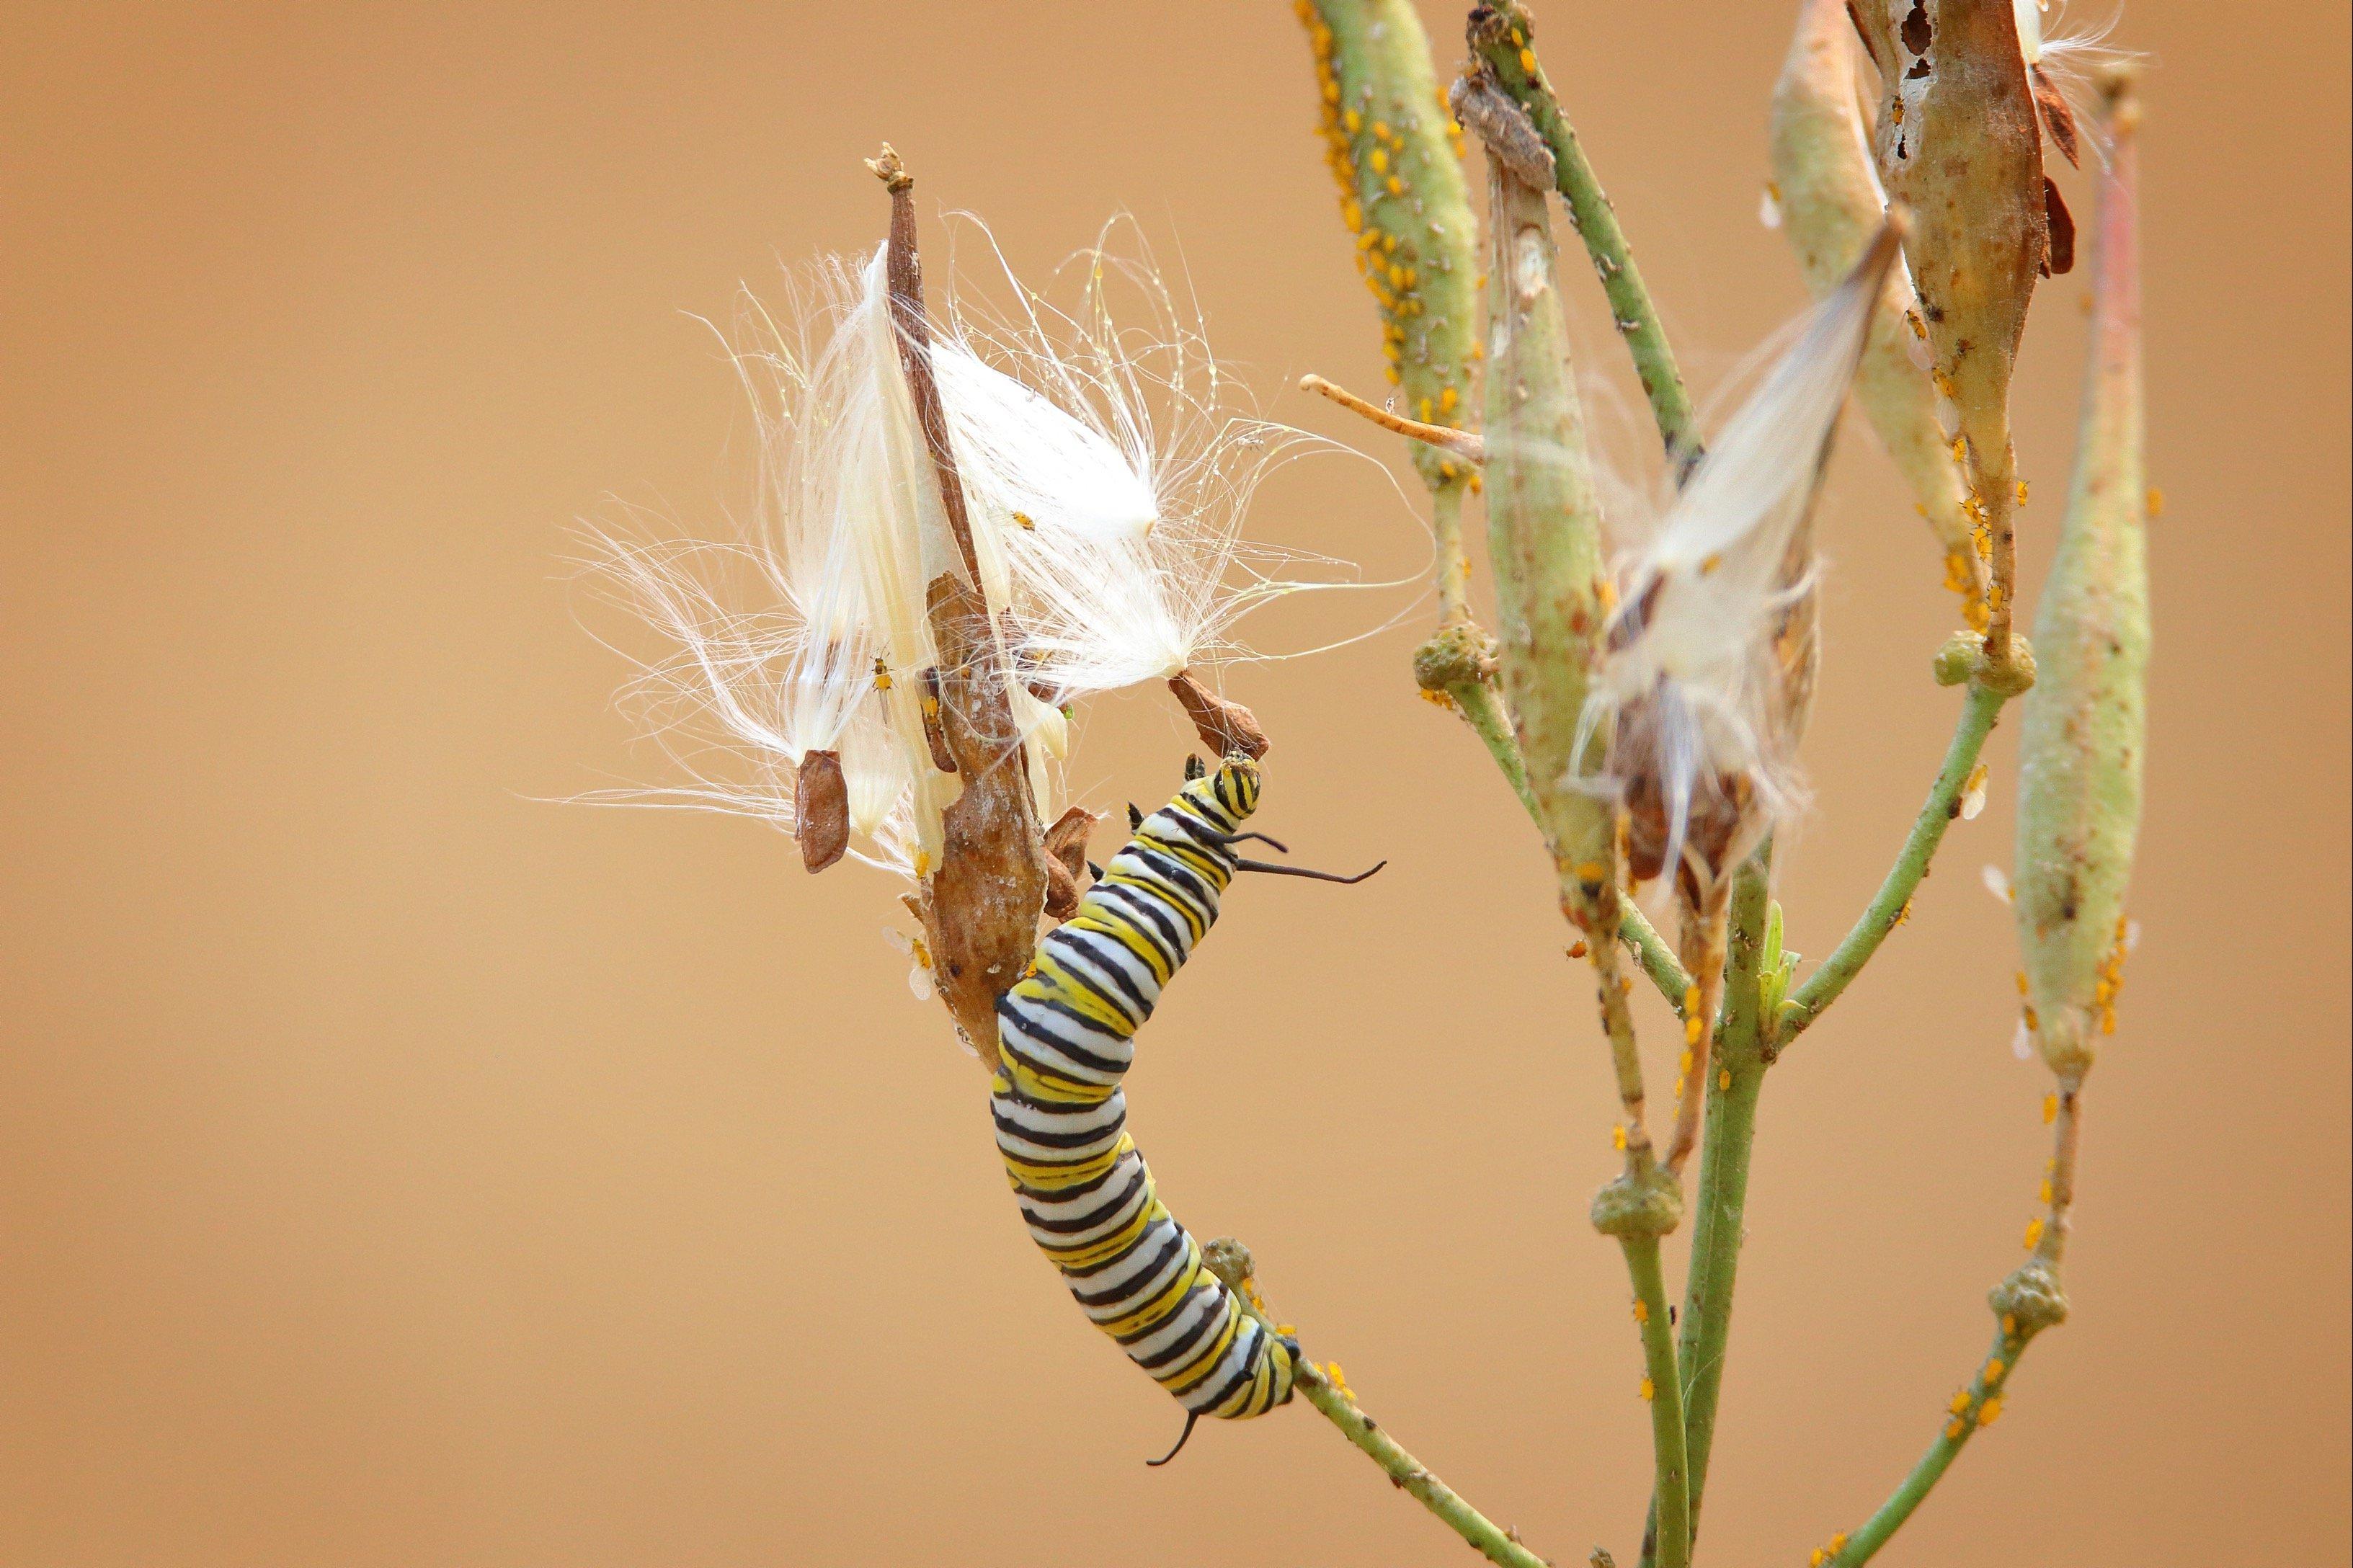 Monarch Caterpillar on milkweed plant